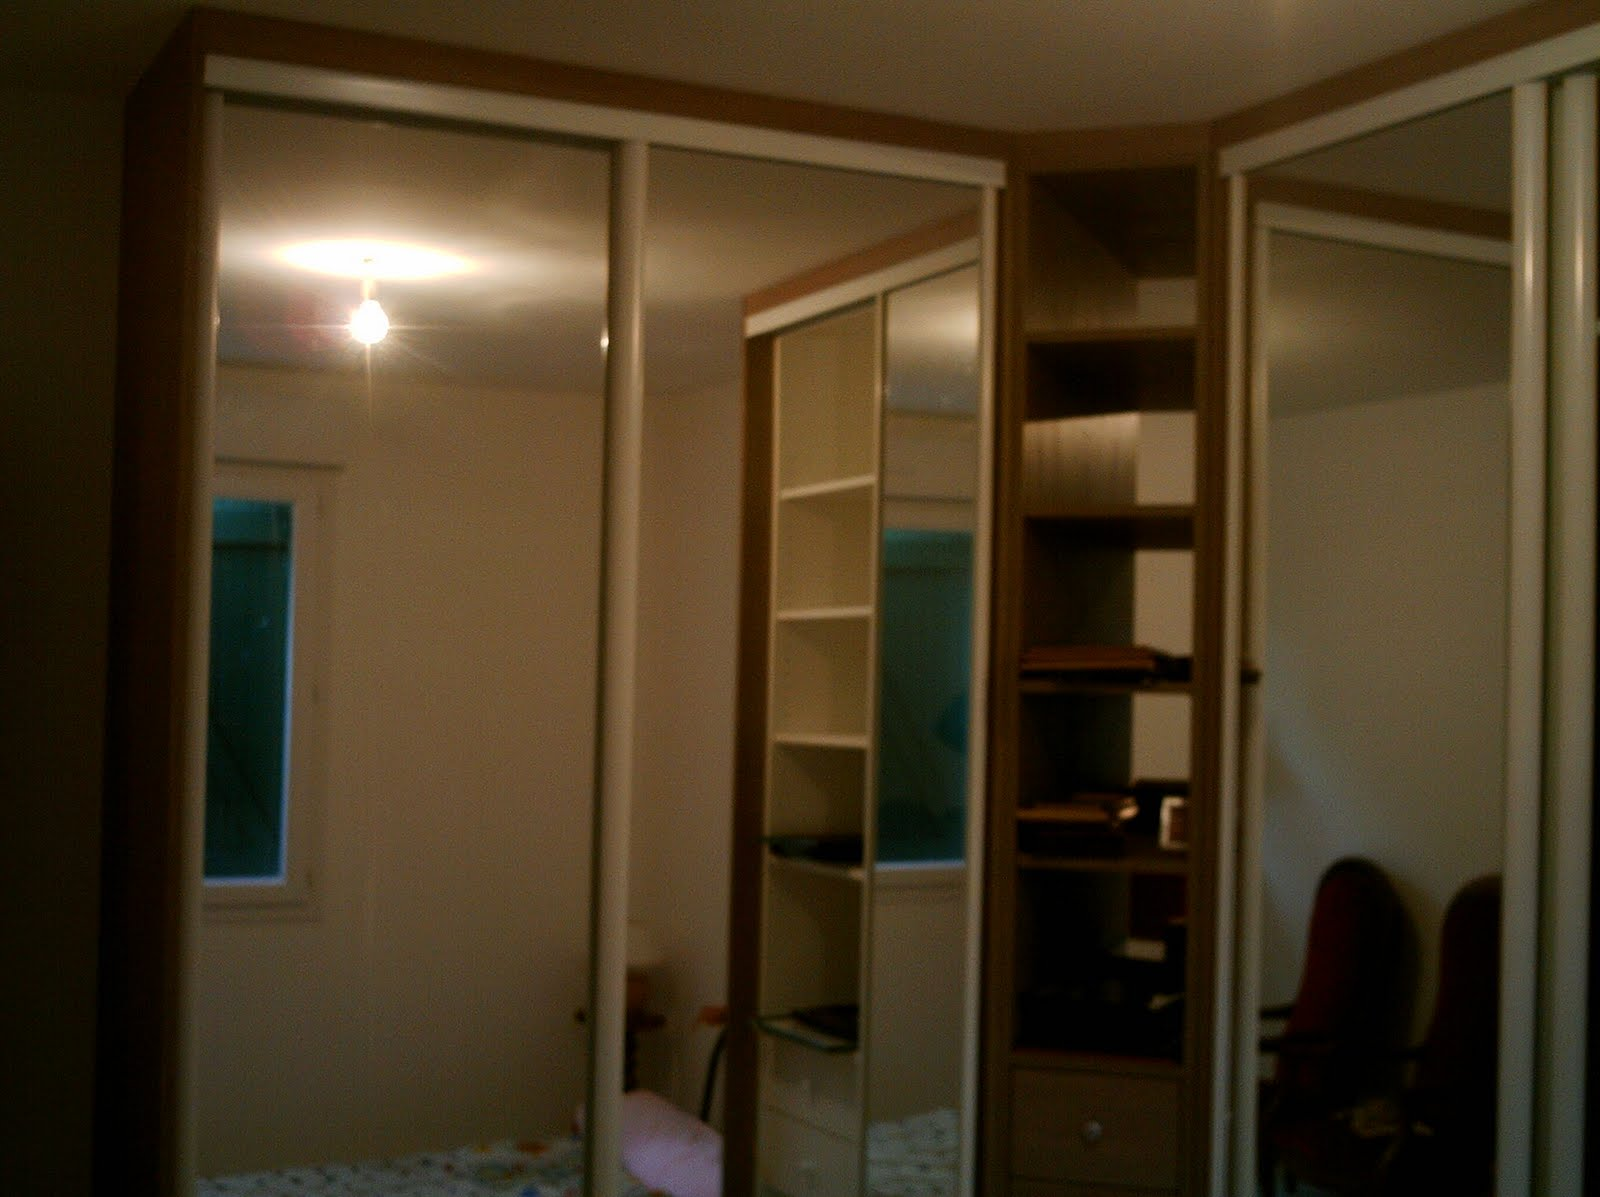 Fabrication dun placard de chambre avec portes coulissantes miroir.